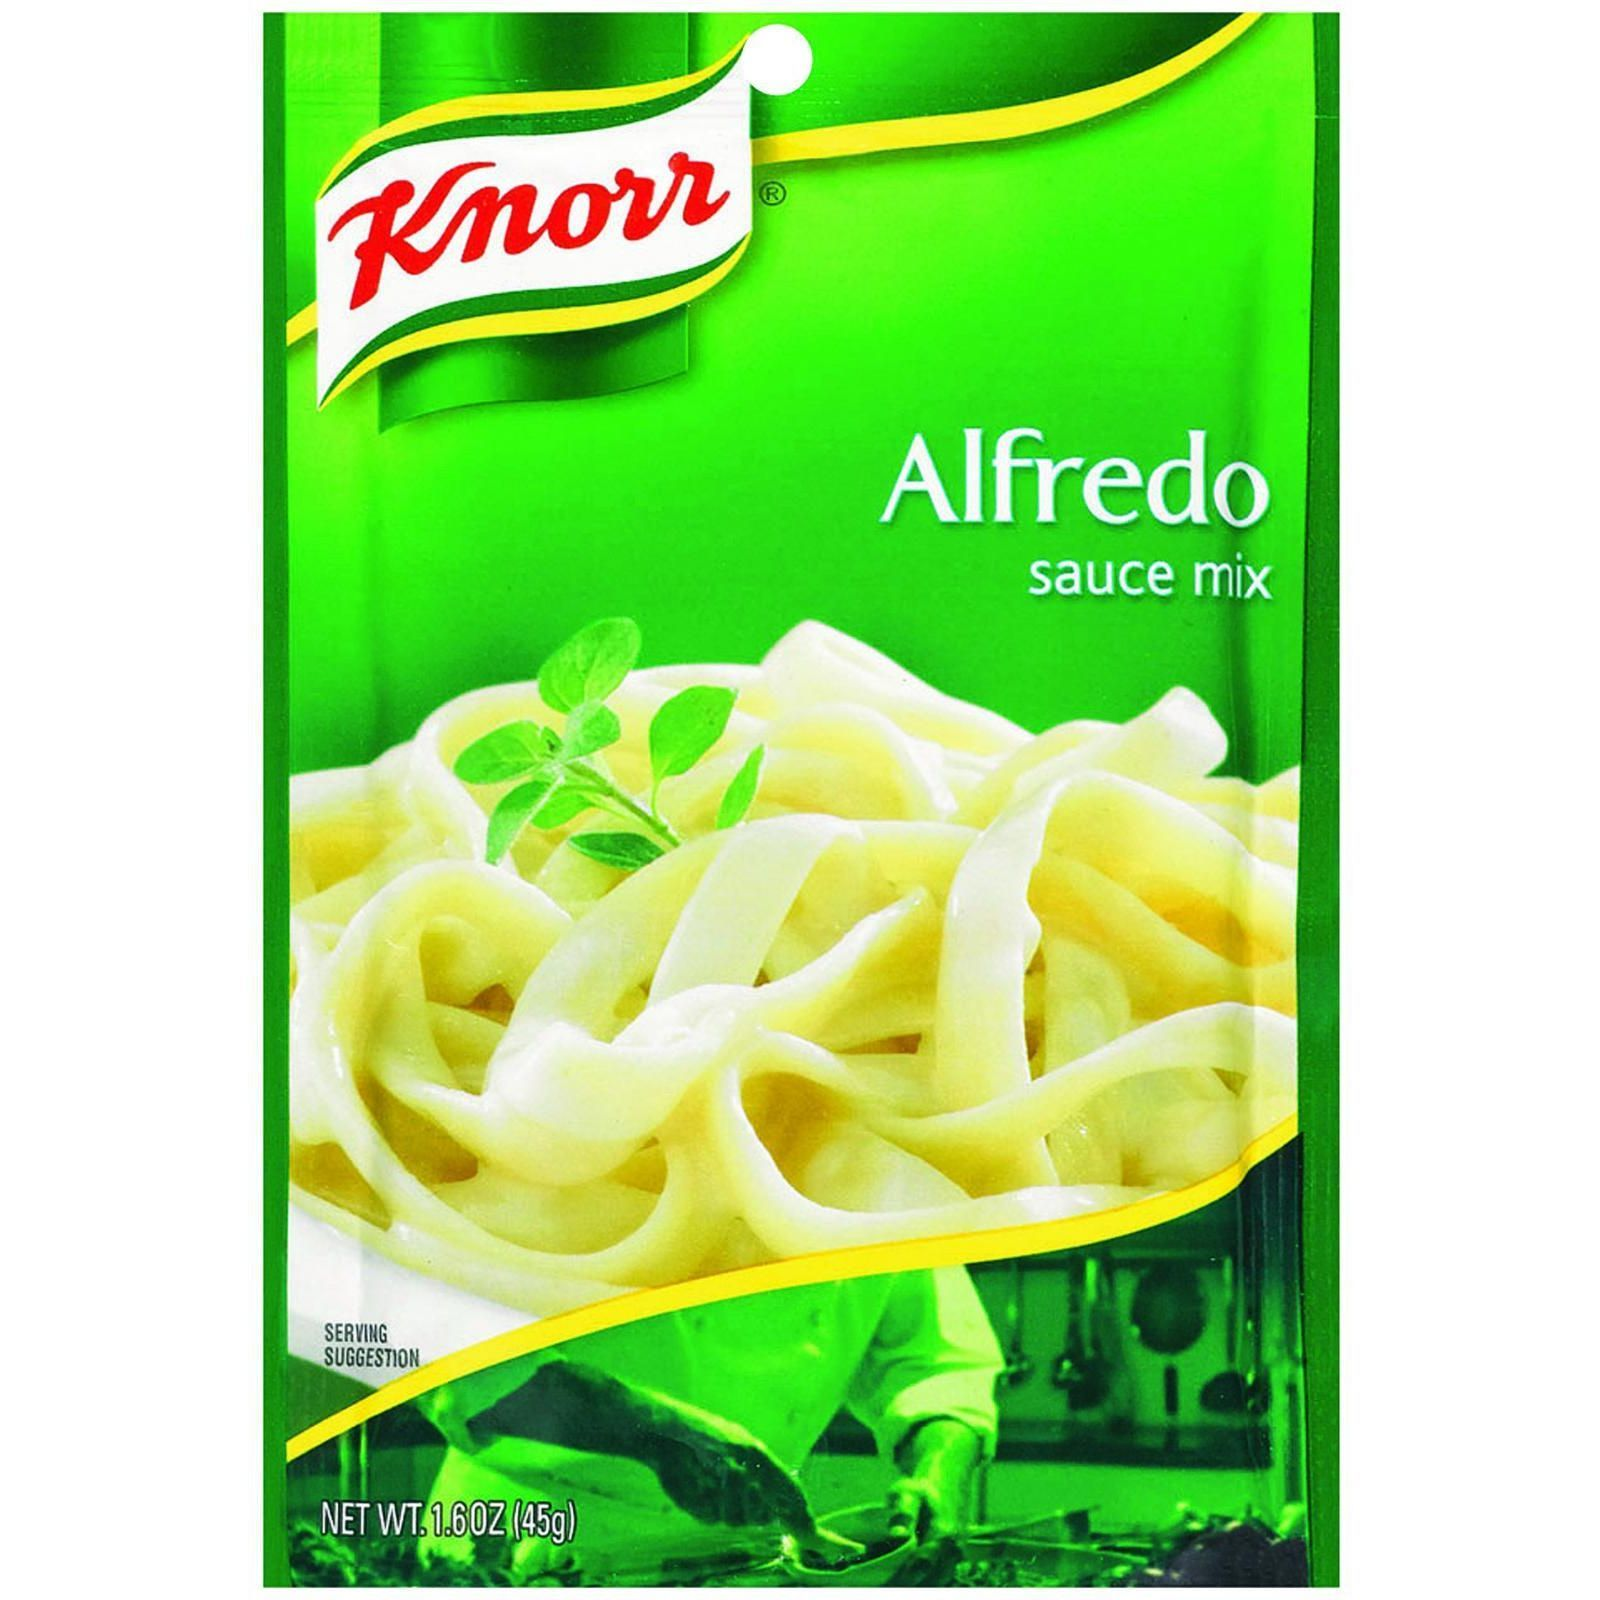 Knorr Sauce Mix - Alfredo - 1.6 oz - Case of 12